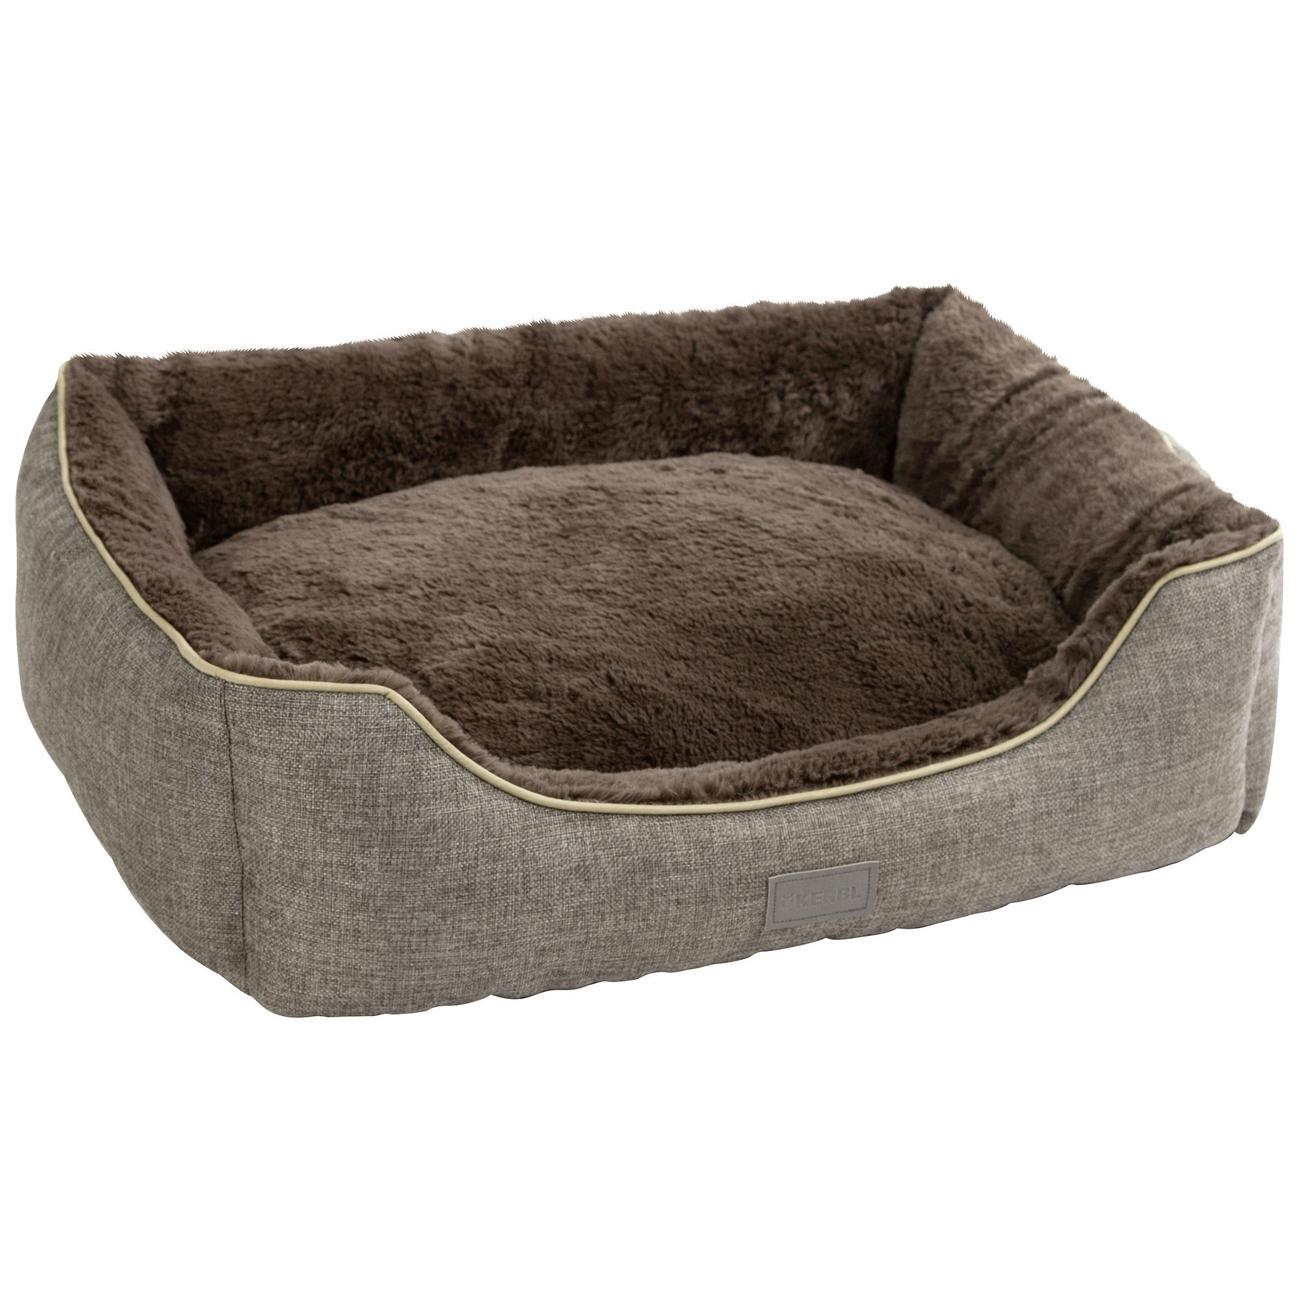 Kerbl Hundebett Katzenbett Samuel, Bild 2